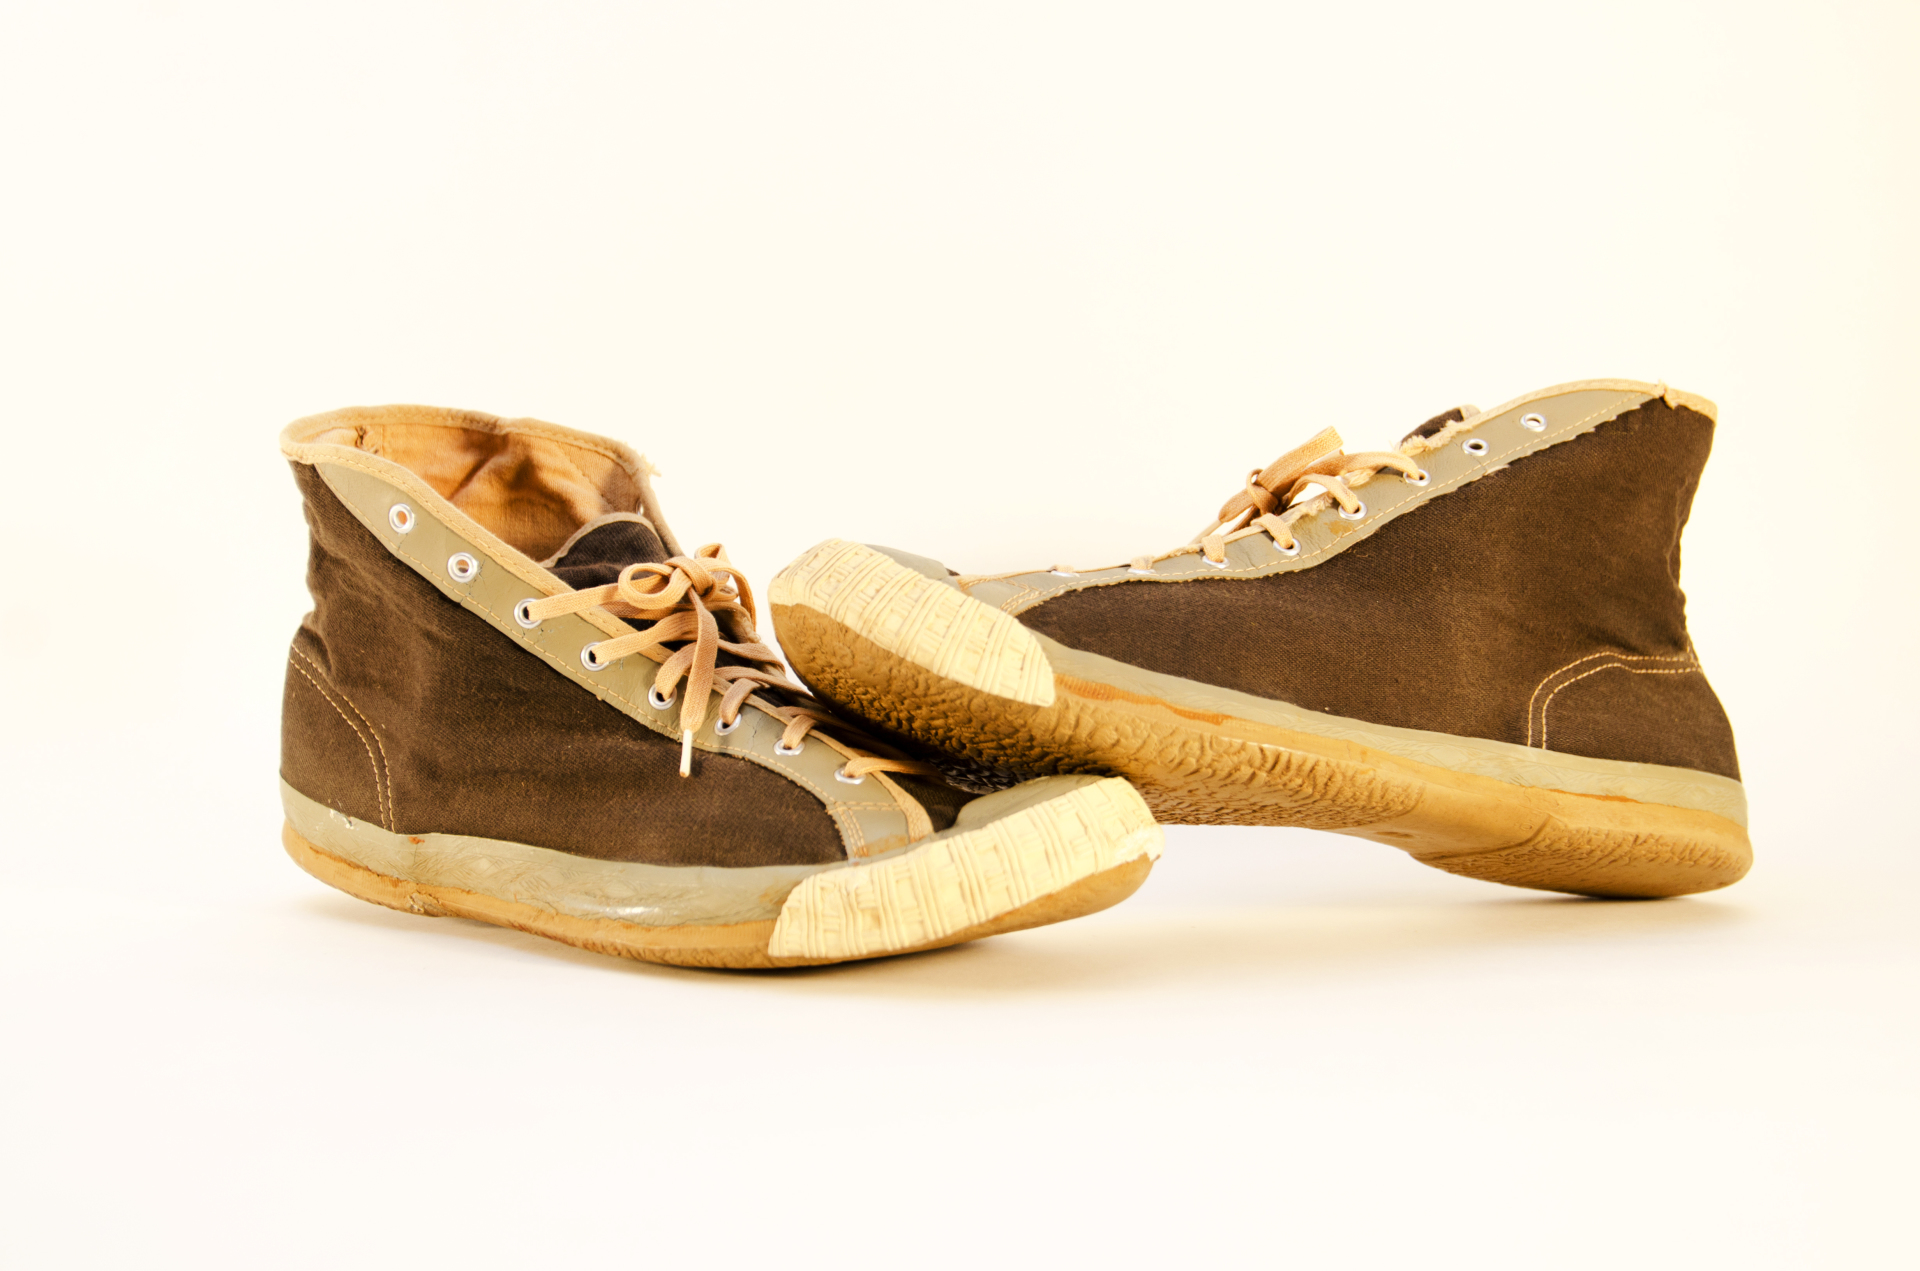 1920 converse sneakers